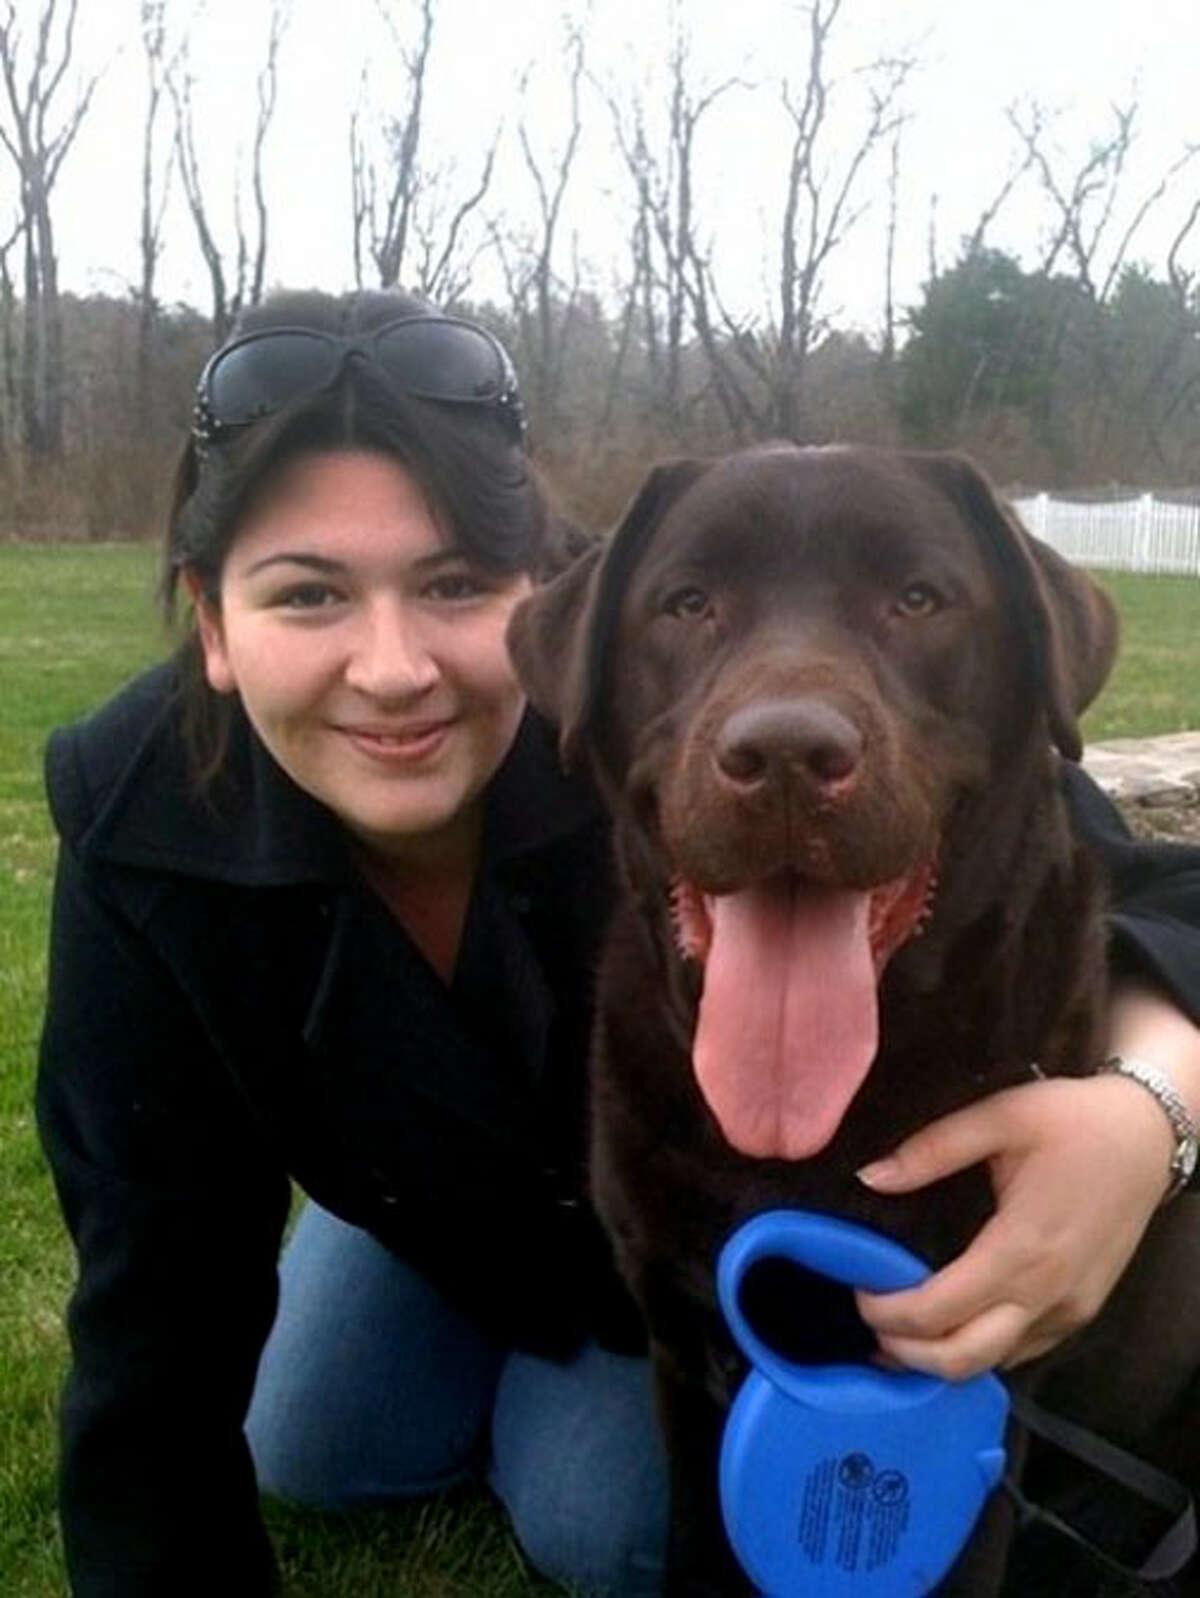 Rachel D'Avino died in the Sandy Hook Elementary School shooting in Newtown, Conn. on Friday, Dec. 14, 2012.